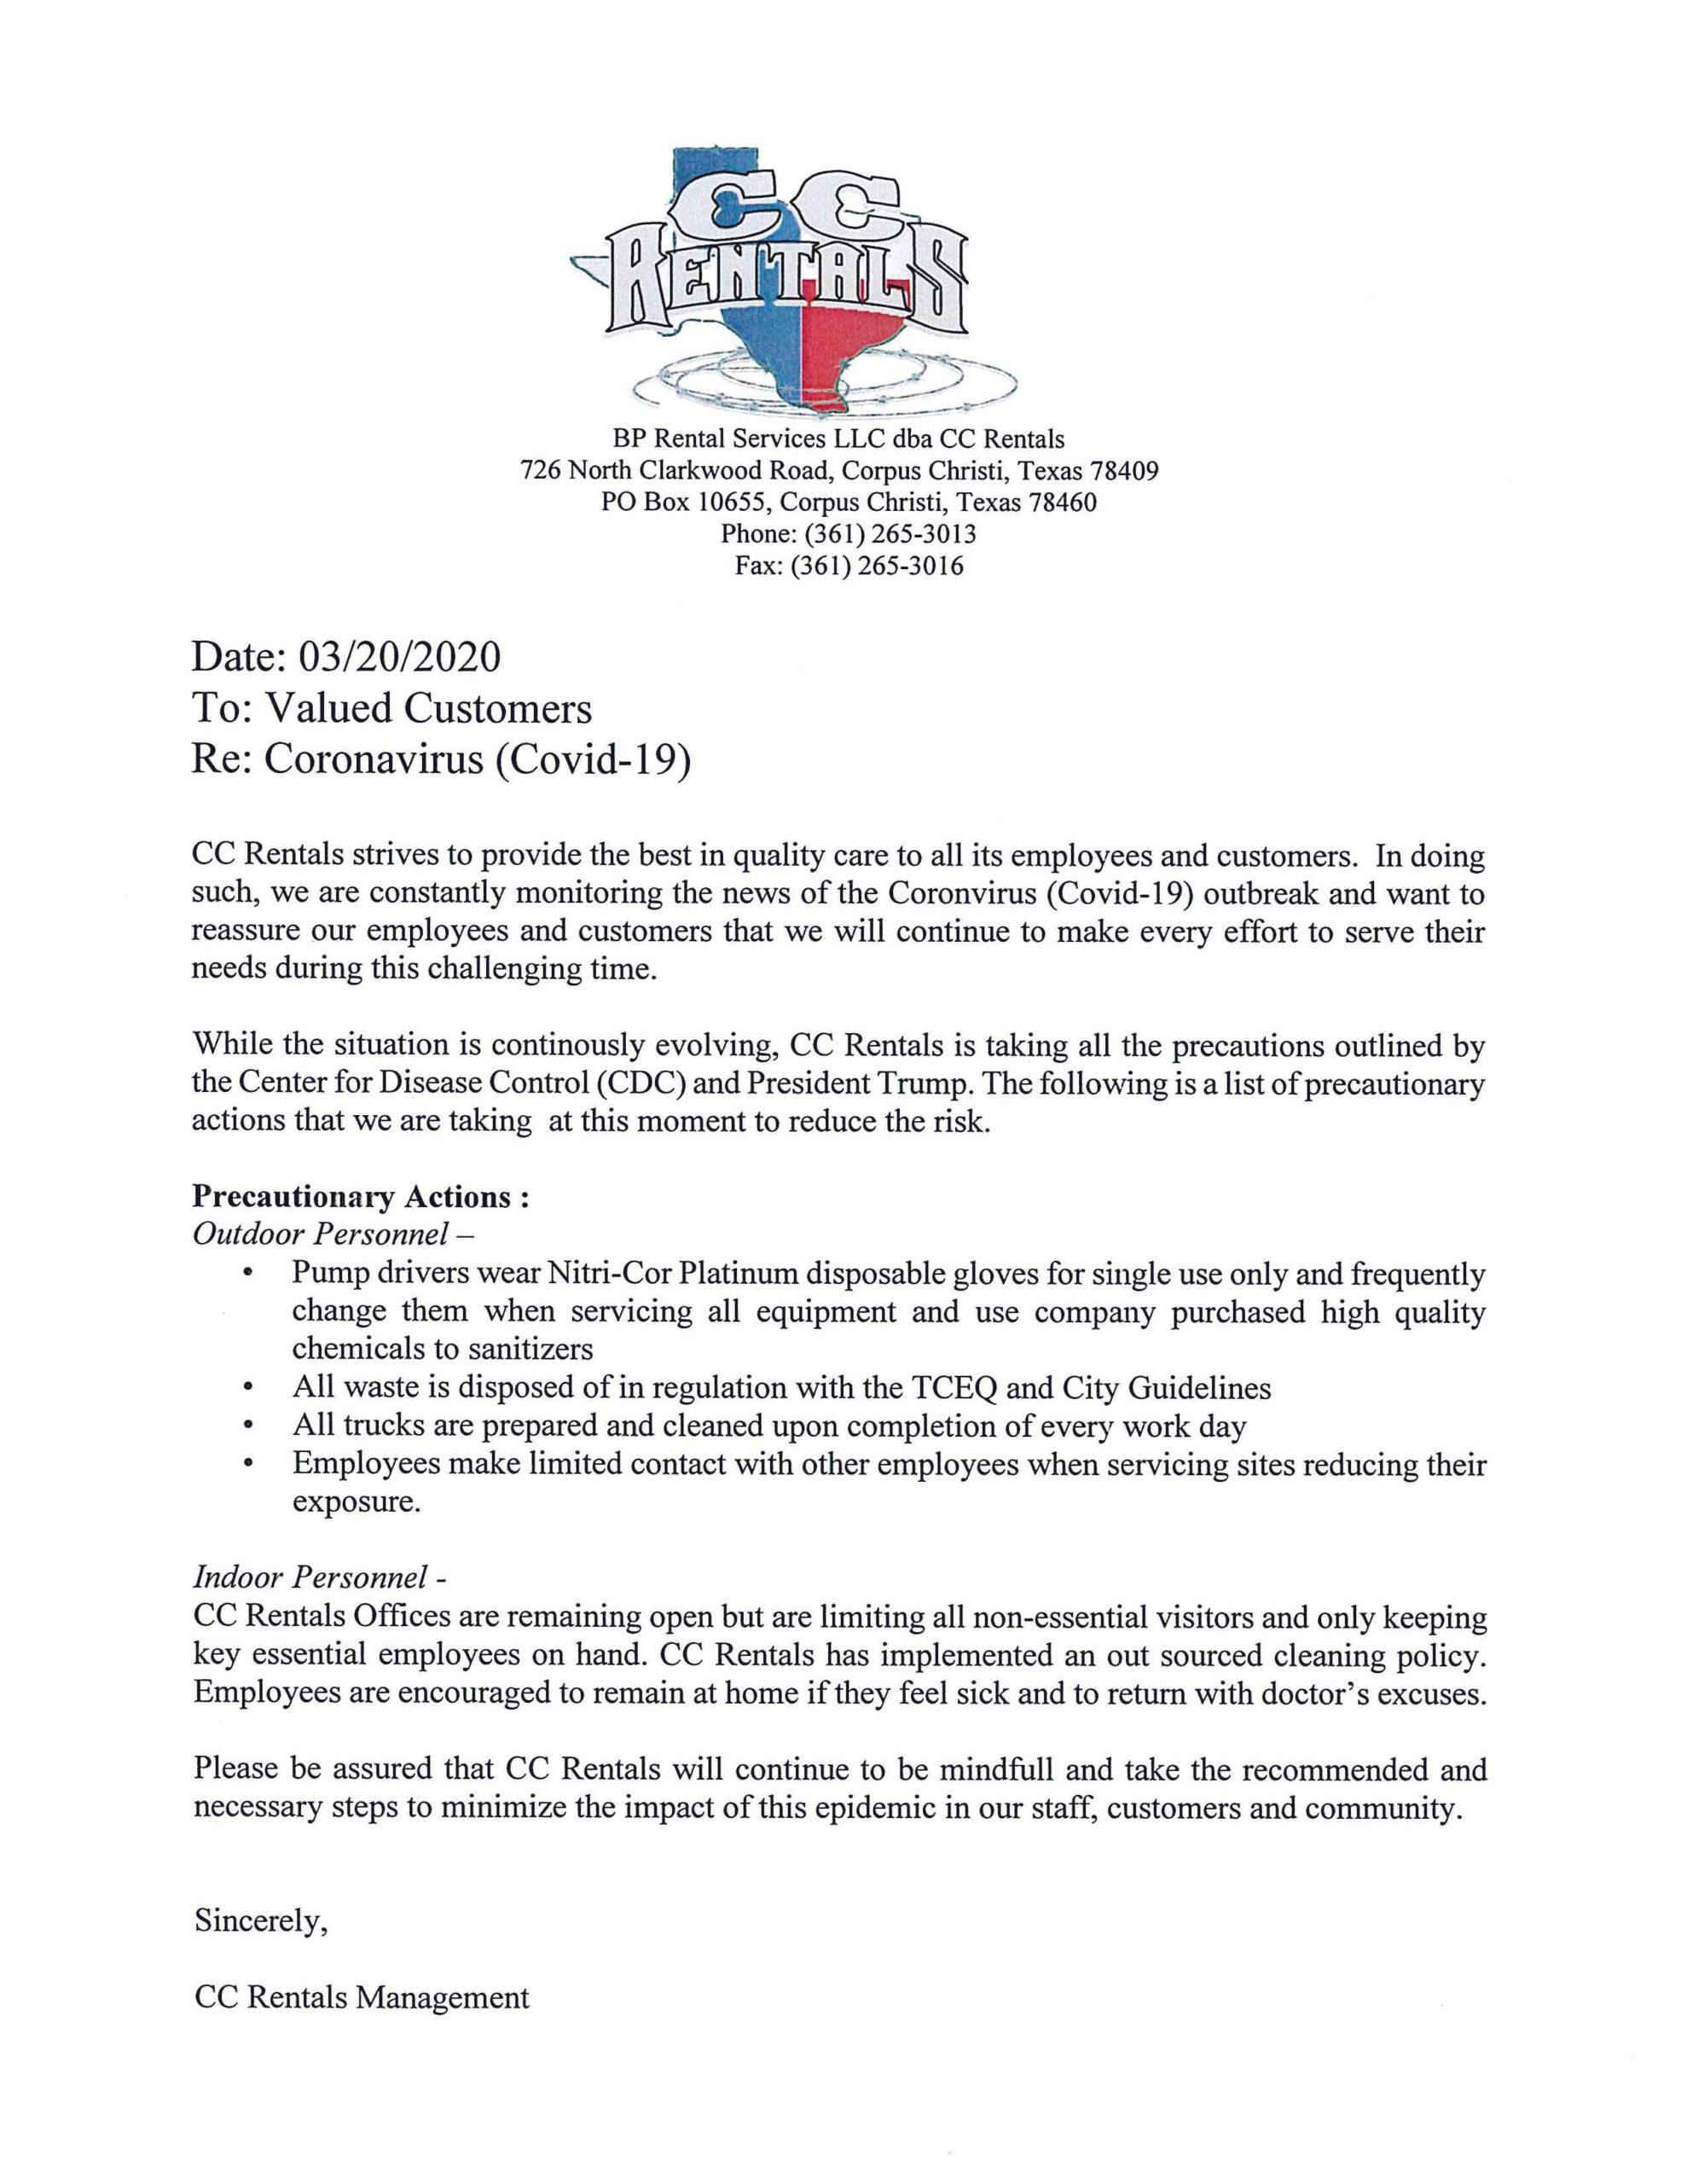 Memo on CoronaVirus to Customers 2020_0699344e-22c2-41b9-bd47-518a304d218f